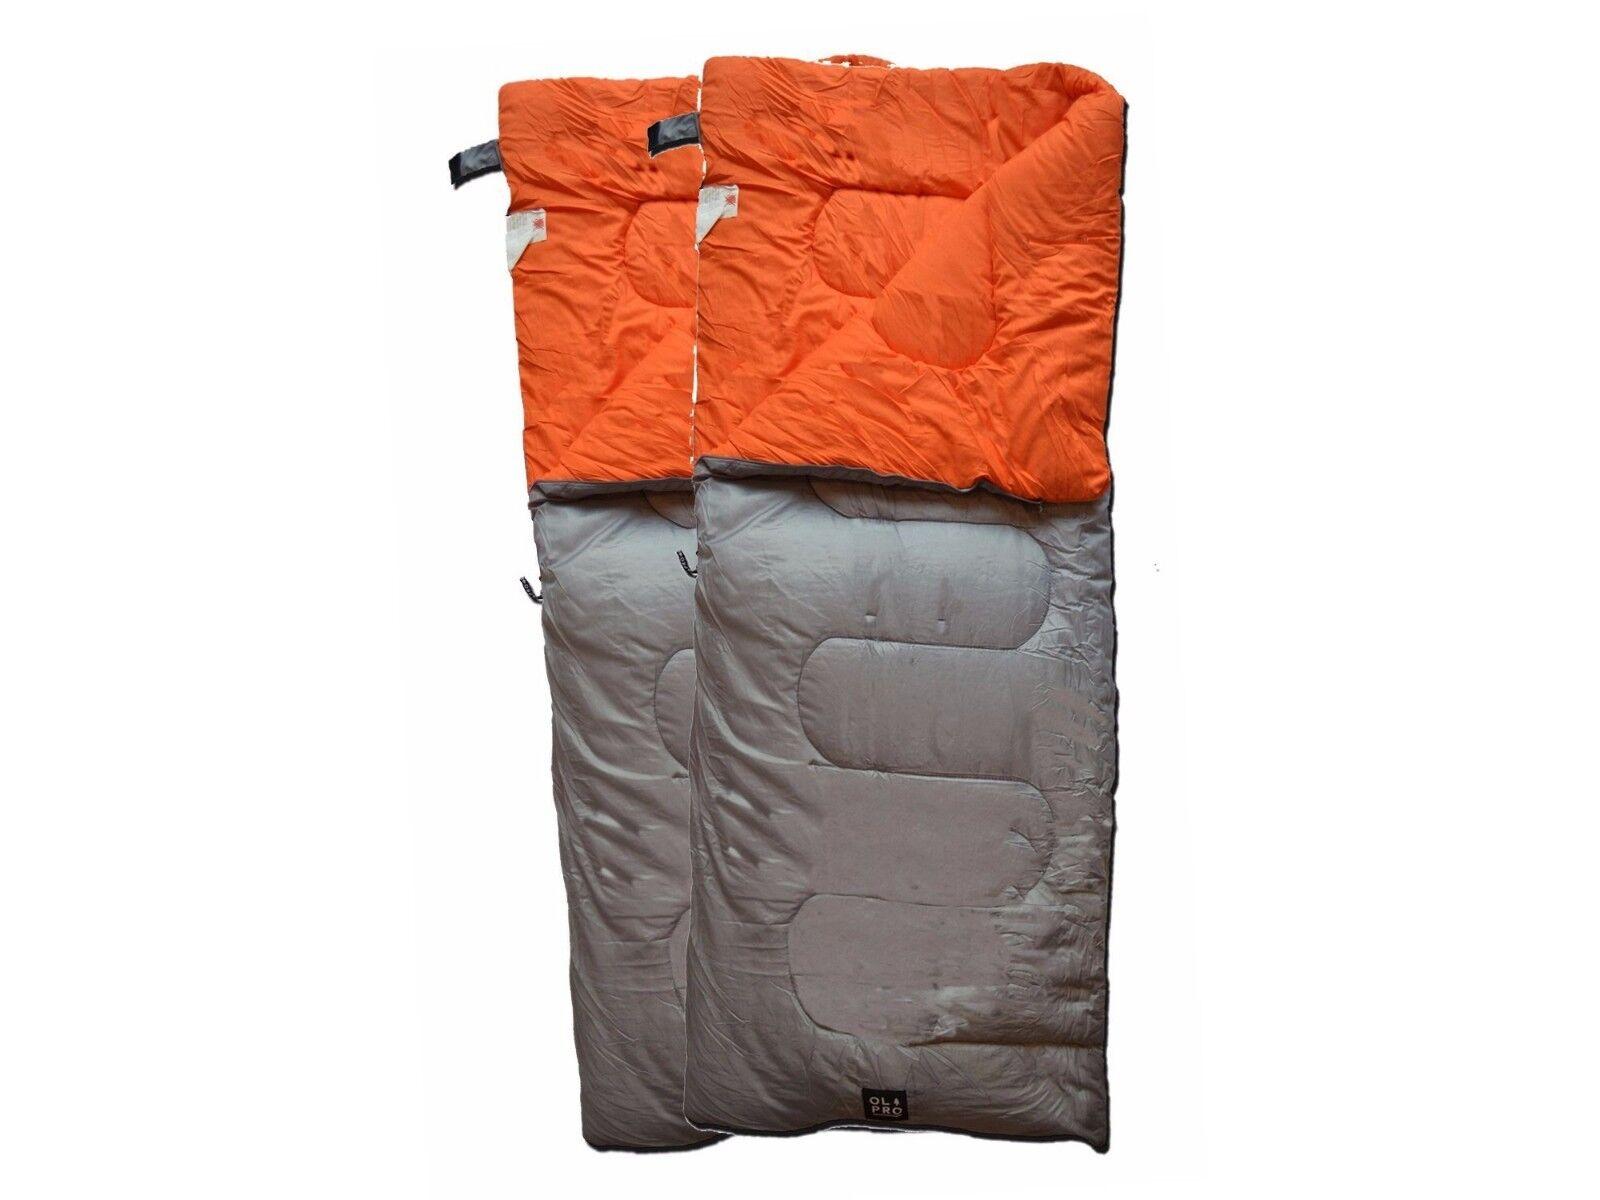 DOUBLE SLEEPING BAG 3 SEASON 300GSM FILL - 2x OLPRO HUSH (PLAIN)